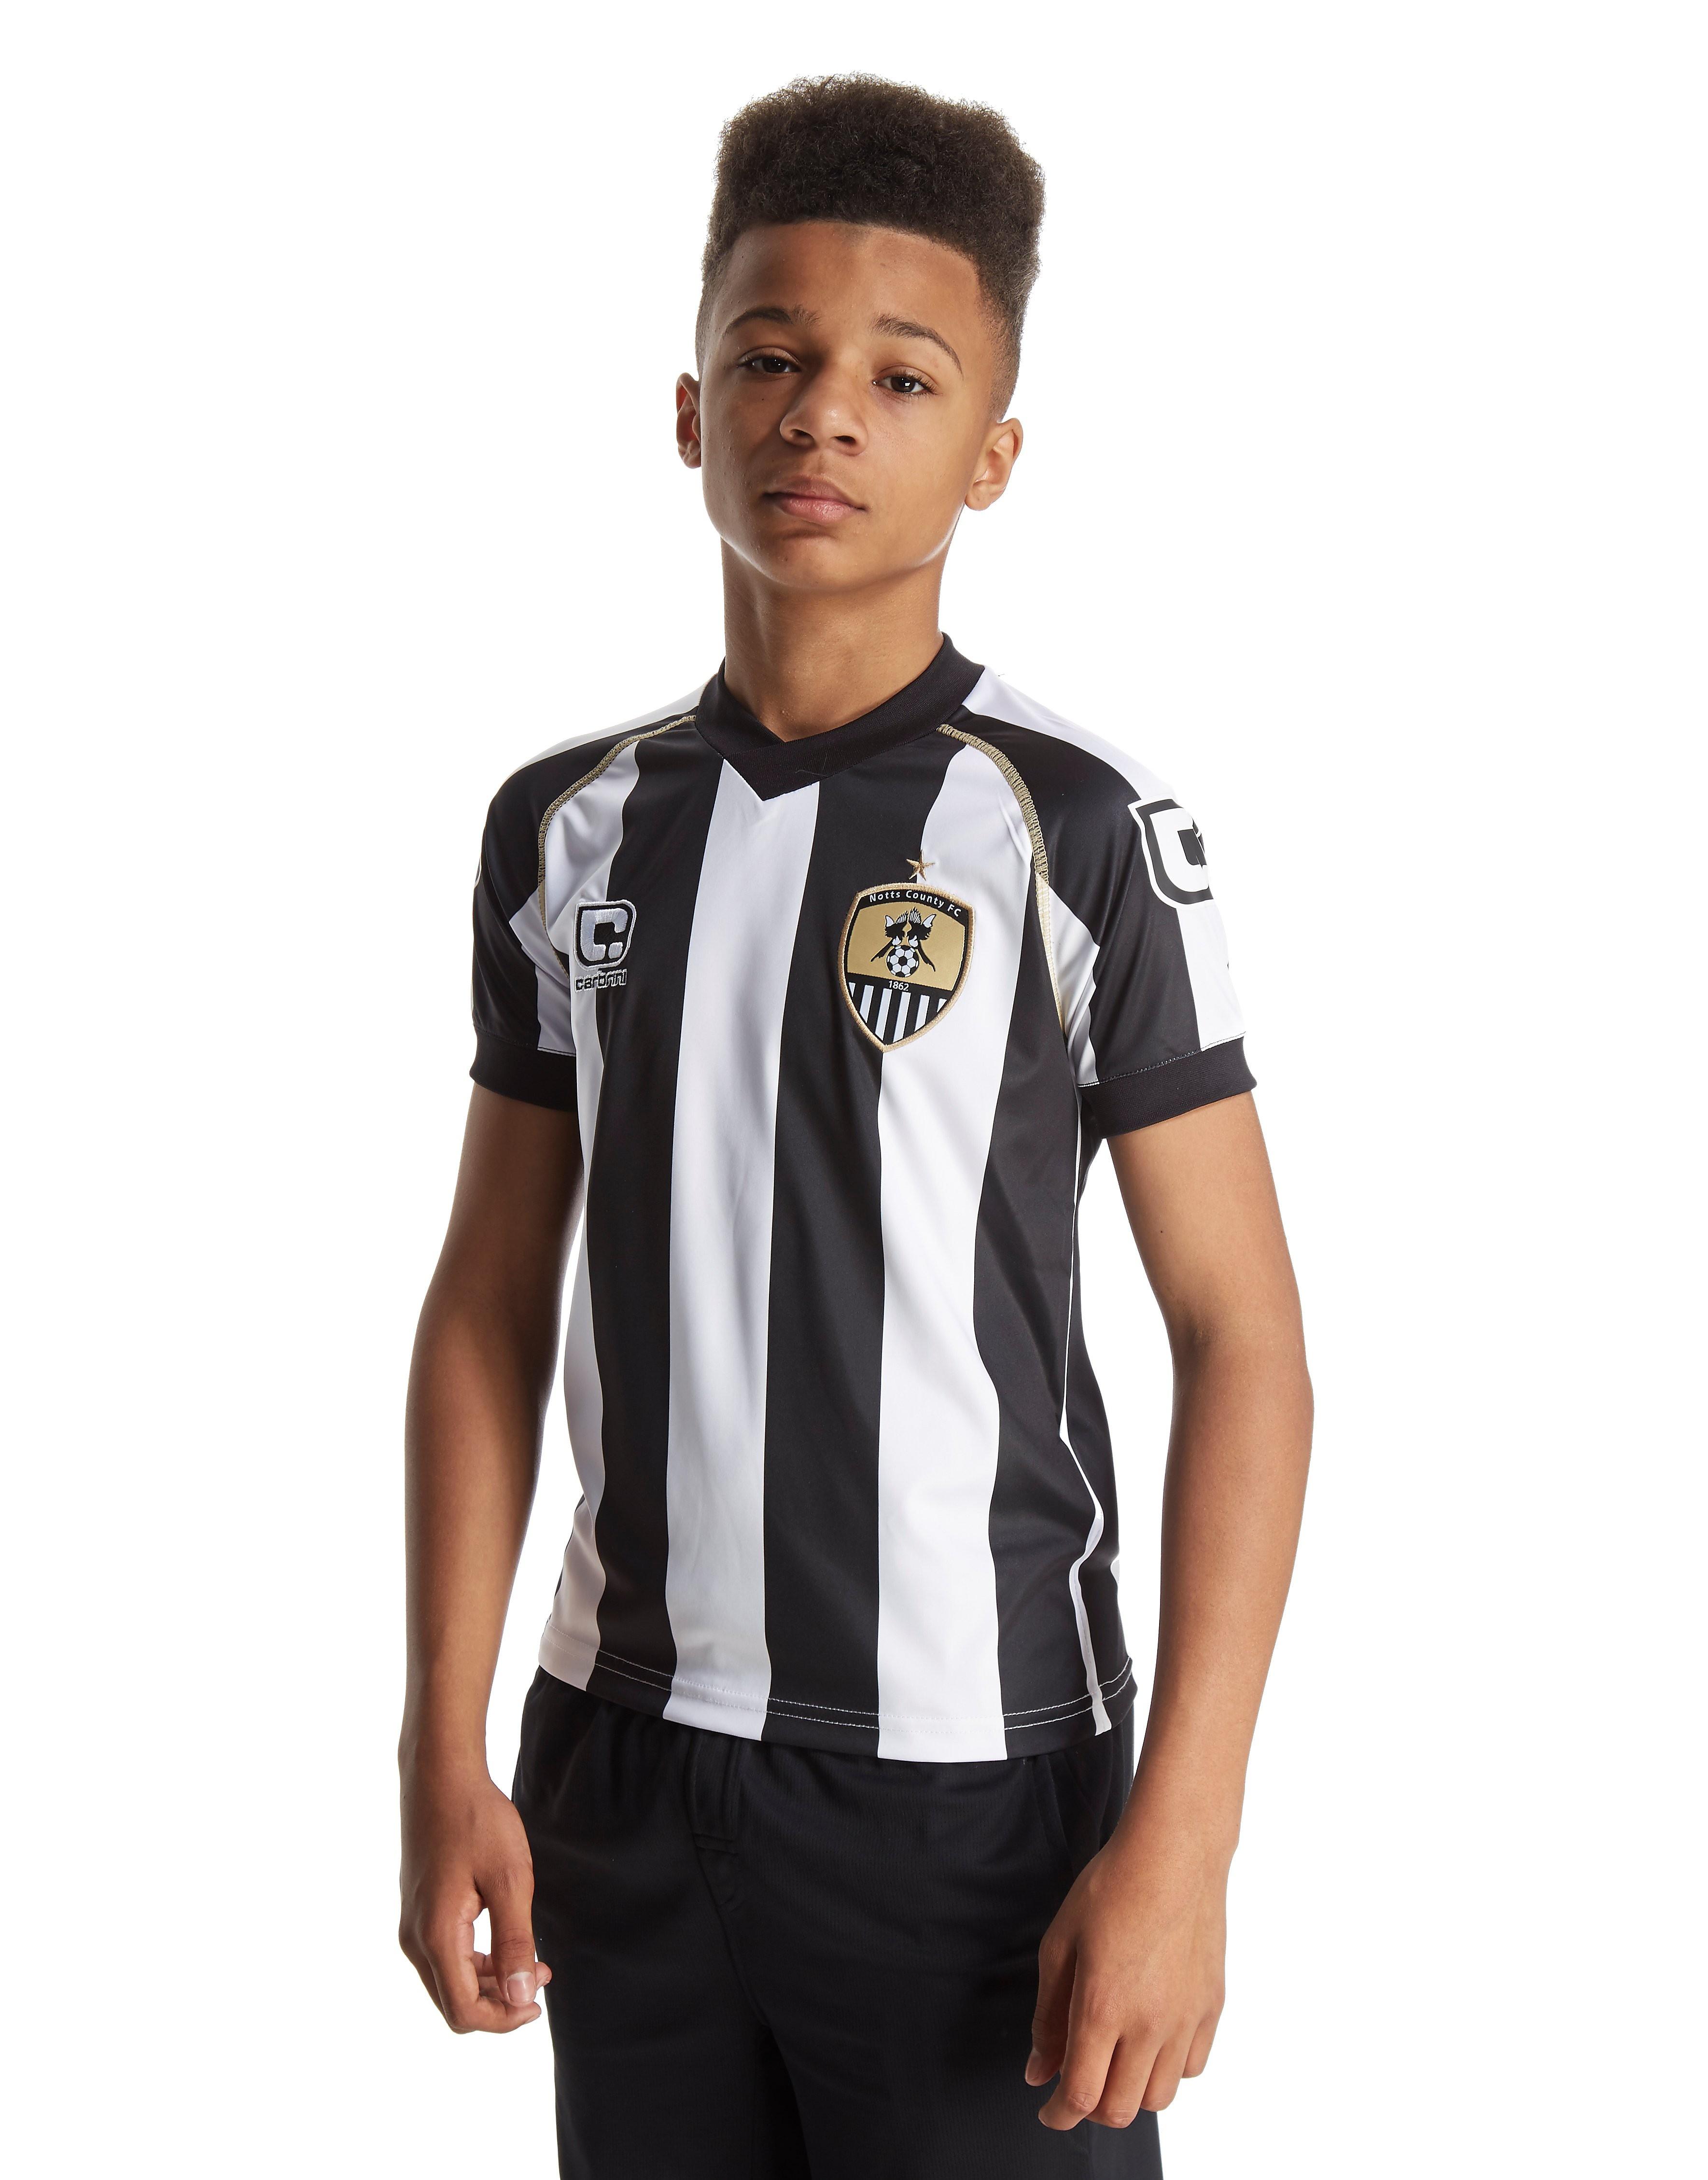 Carbrini Notts County FC 2016/17 Home Shirt Junior